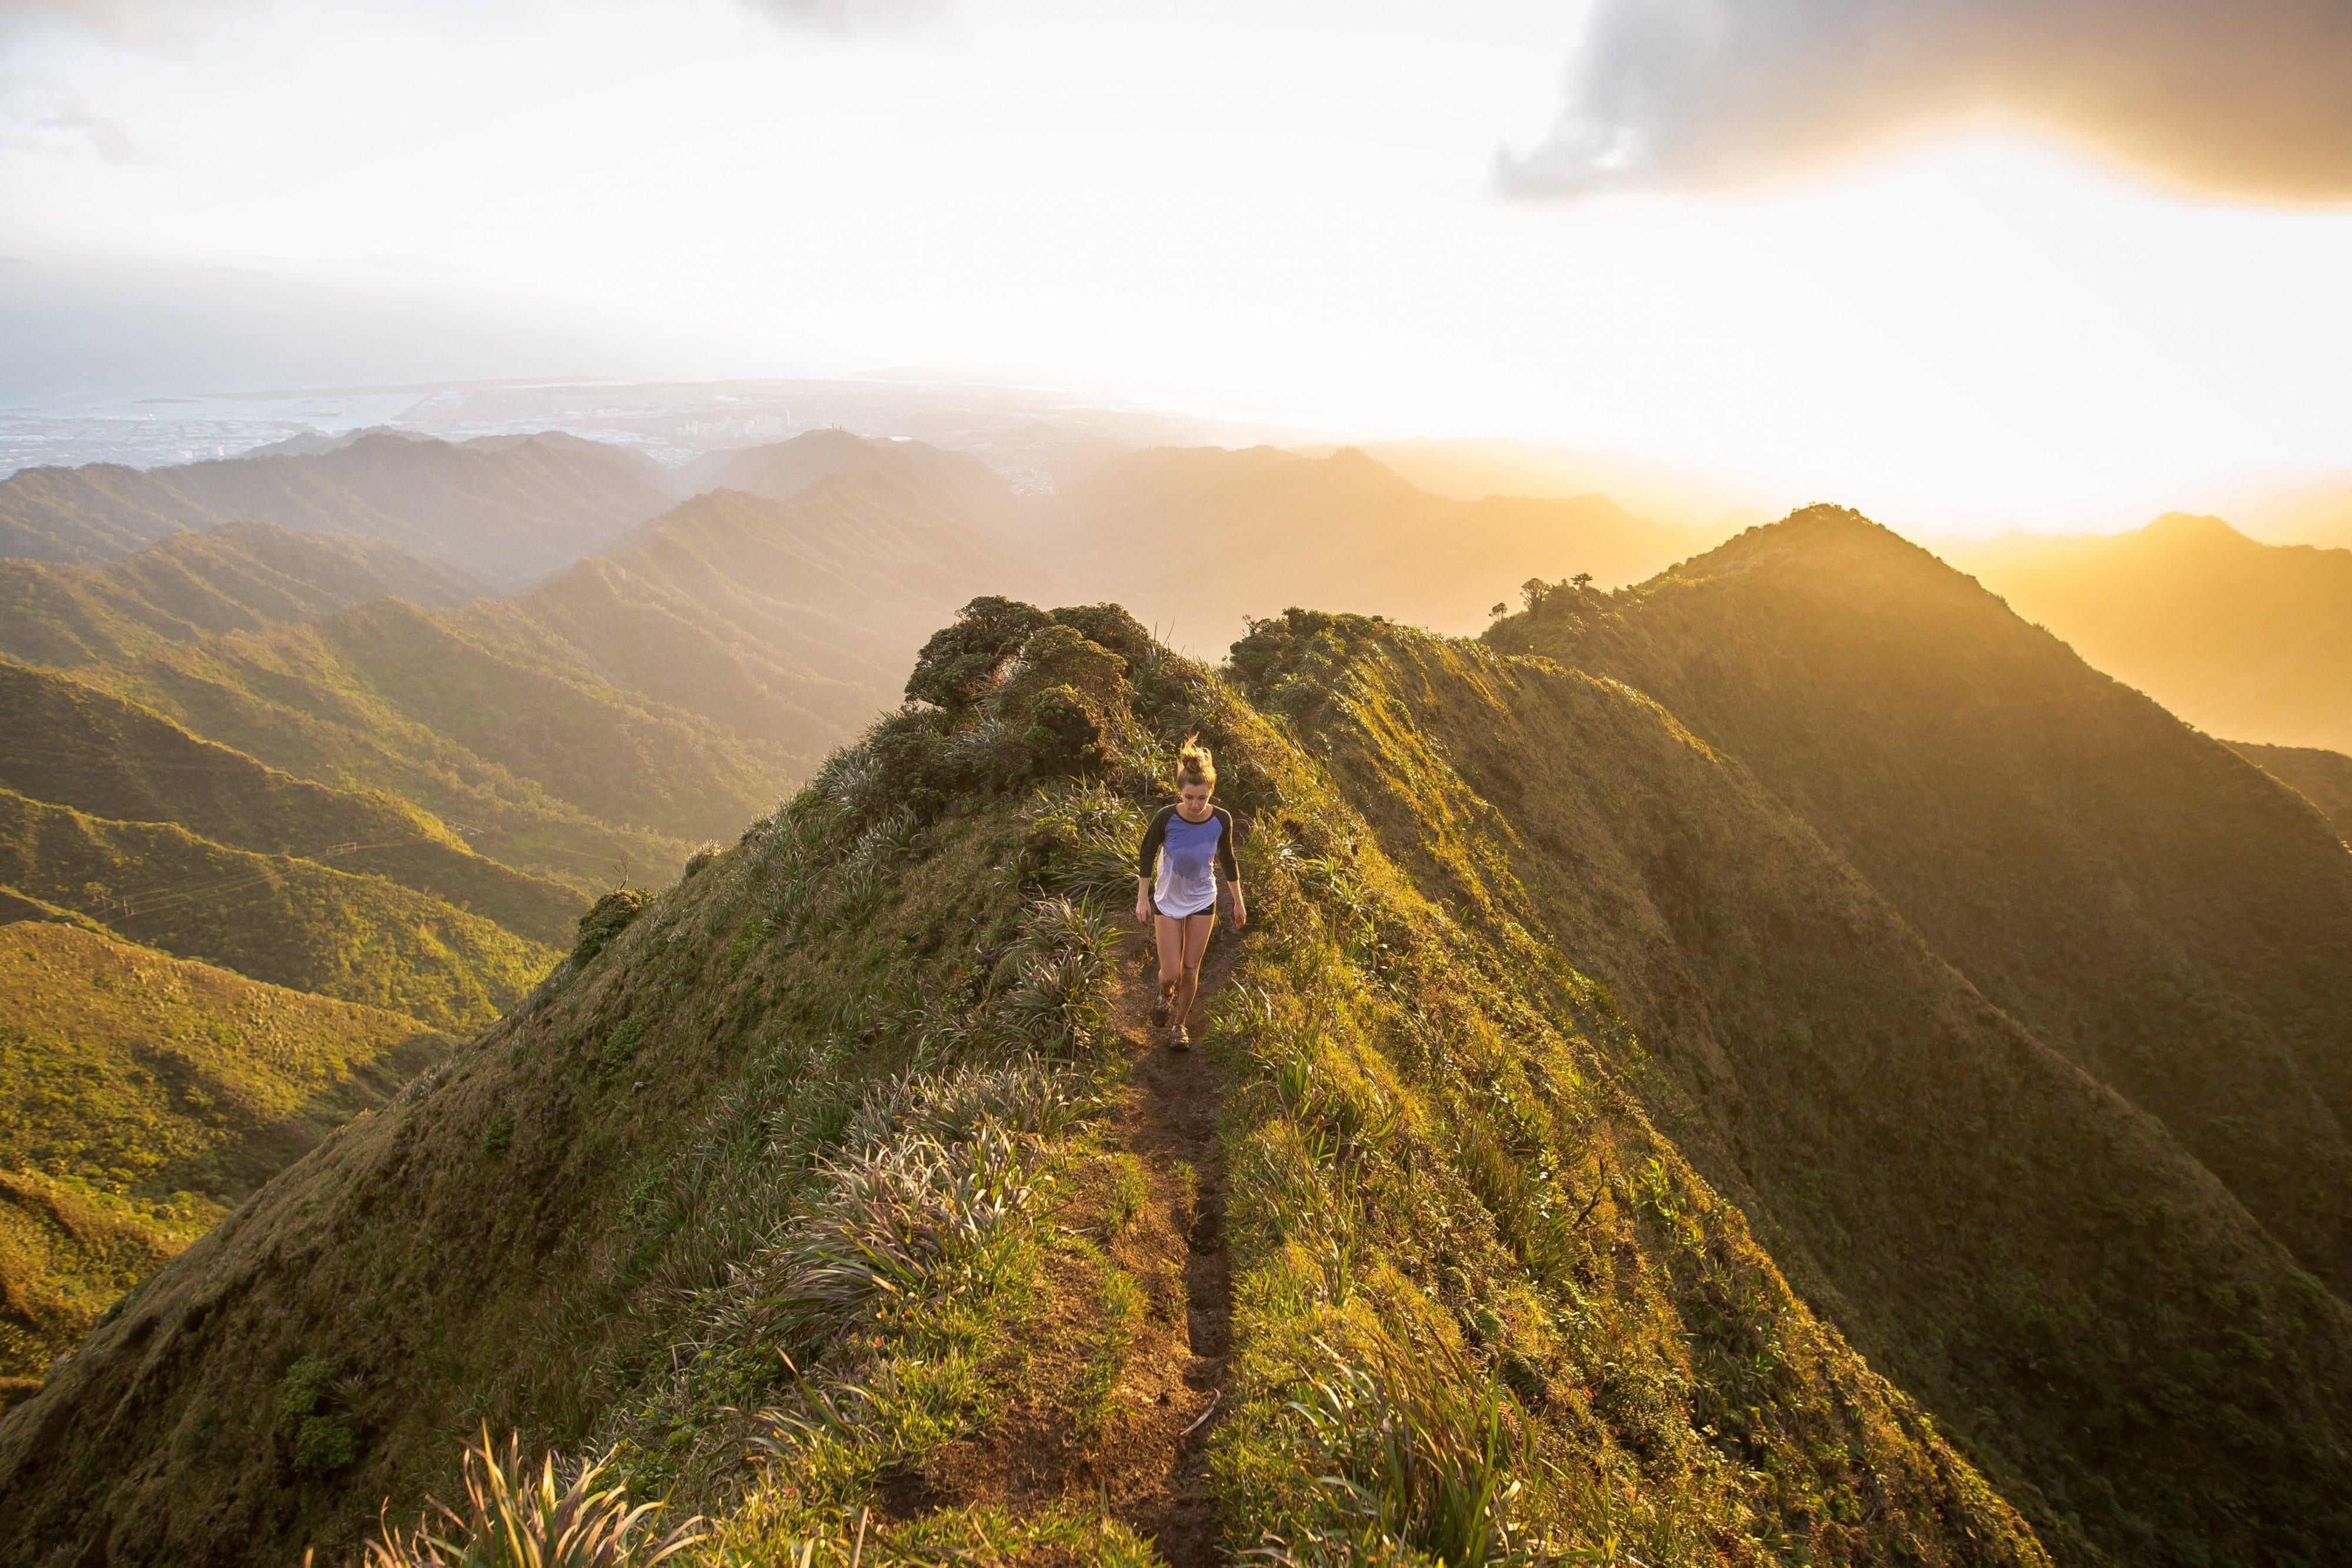 Relax More - Zelfcompassie, interview met Kristin Neff